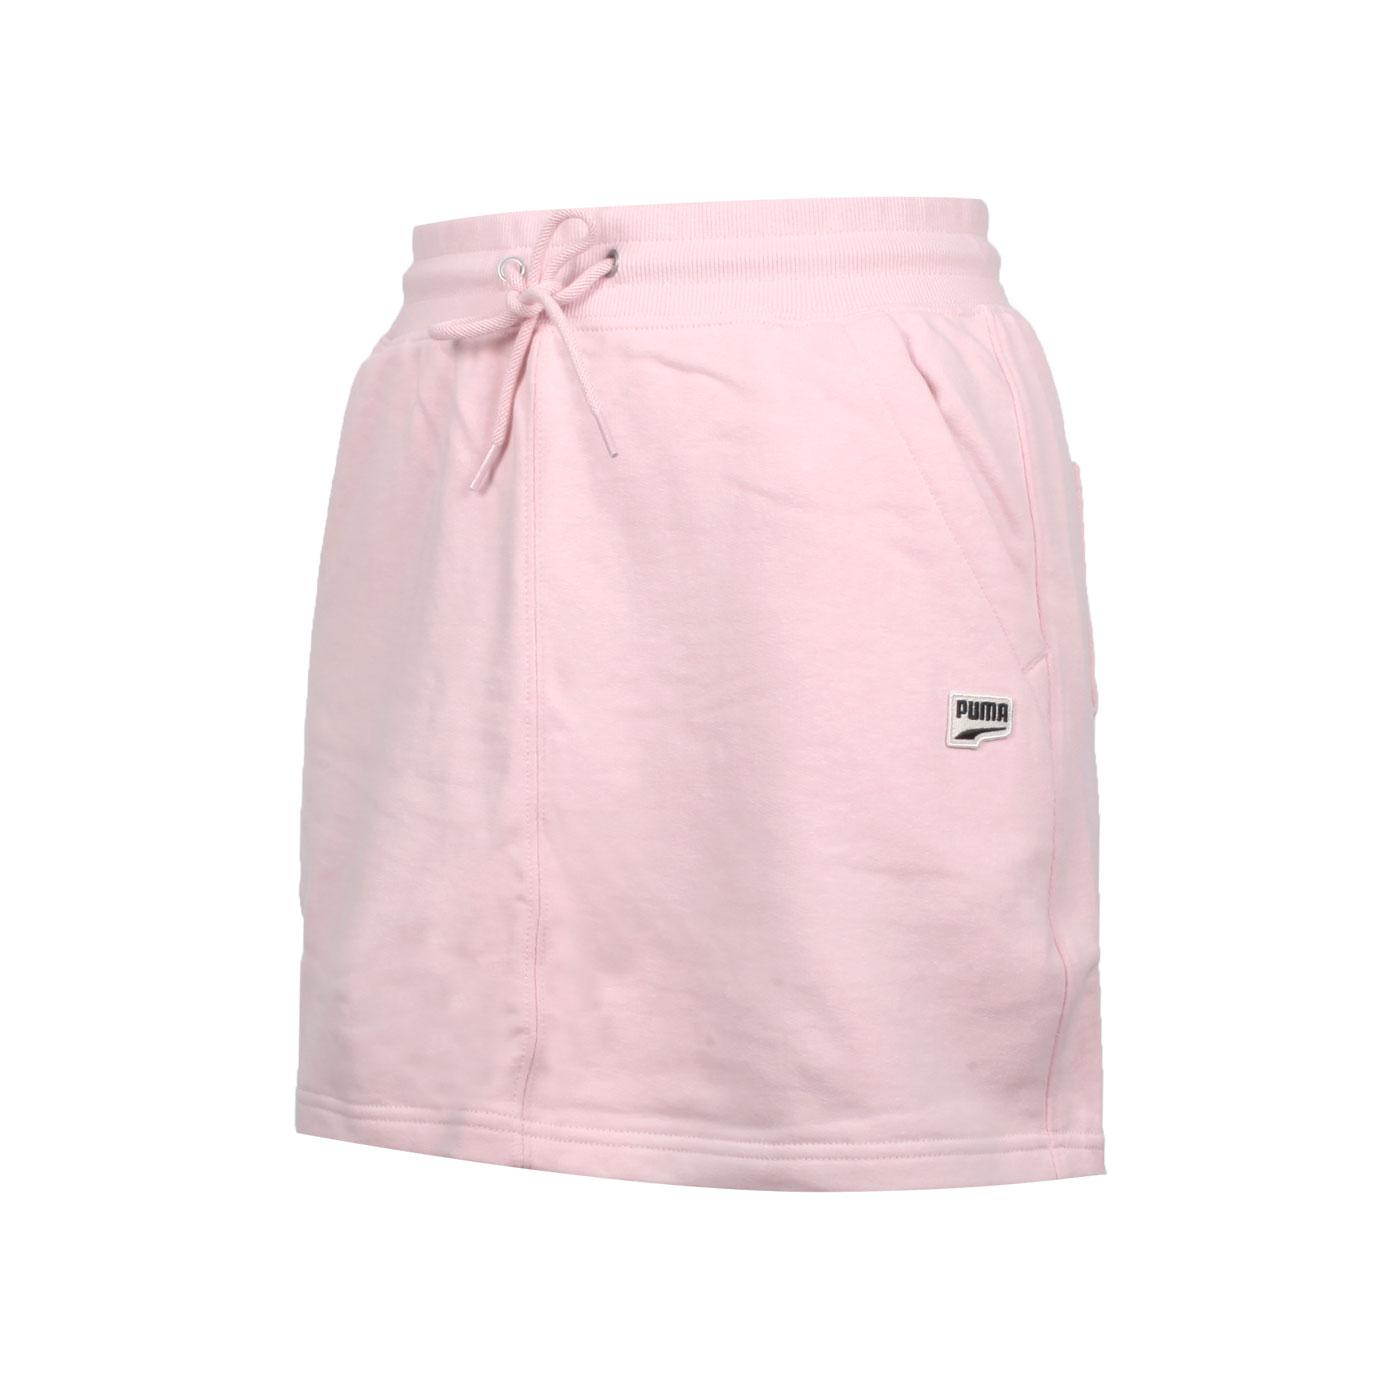 PUMA 女款流行系列Downtown短裙 53169436